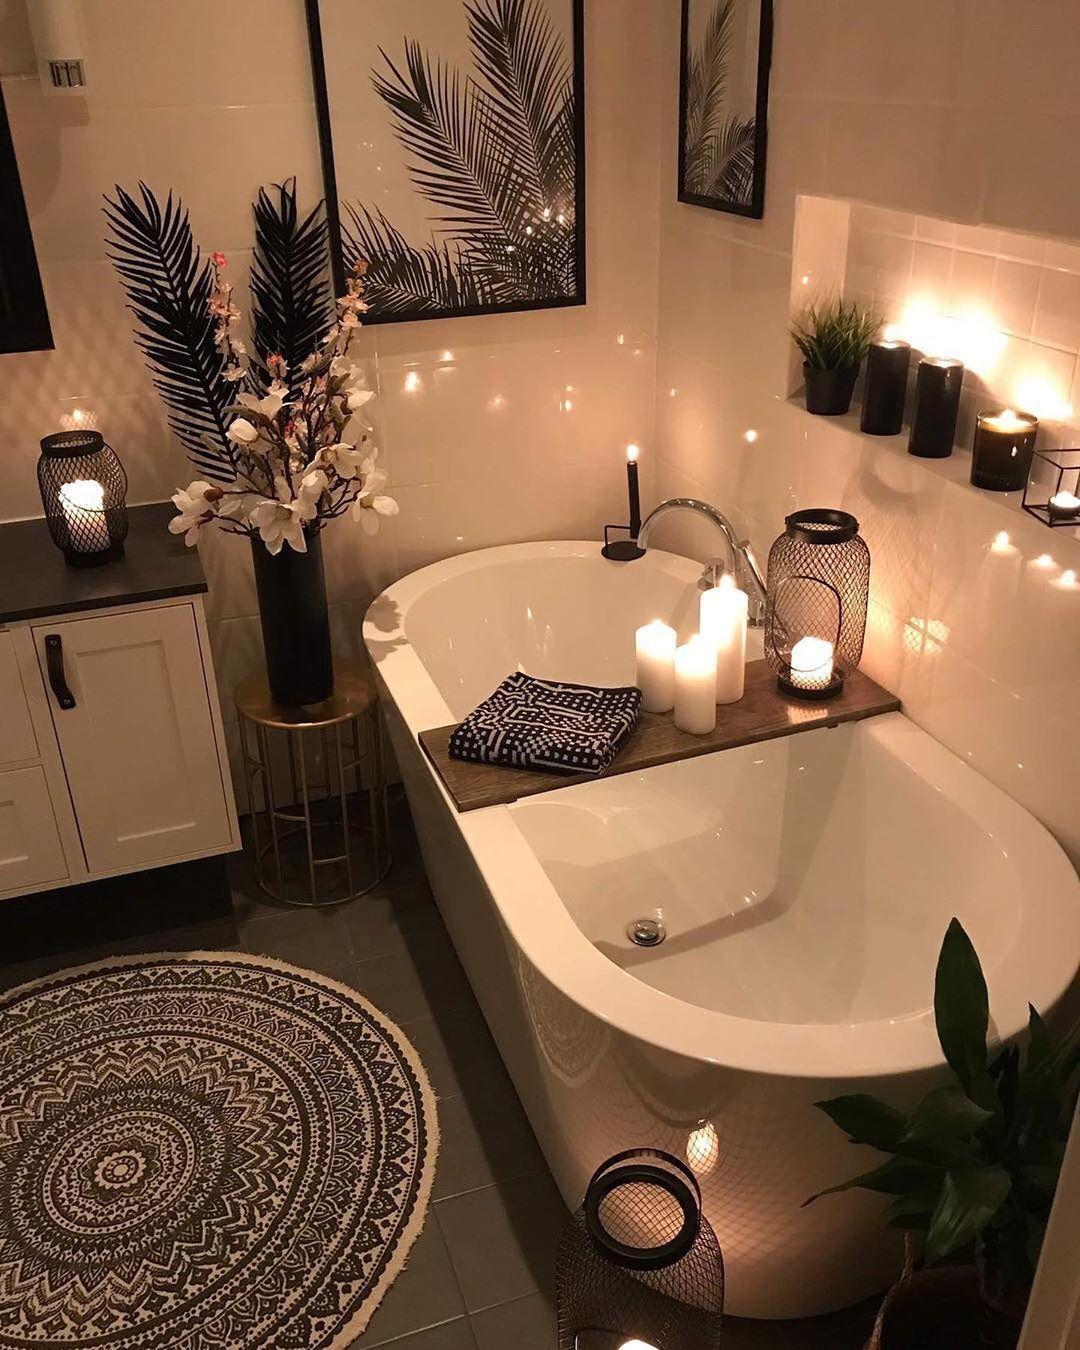 Fagerhoi Hjemmet ديكور ديكورات مطبخ مطابخ مجلس صالون صاله صوره صورة فن ابداع مودرن Cozy Bathroom Bathtub Design Bathroom Interior Design